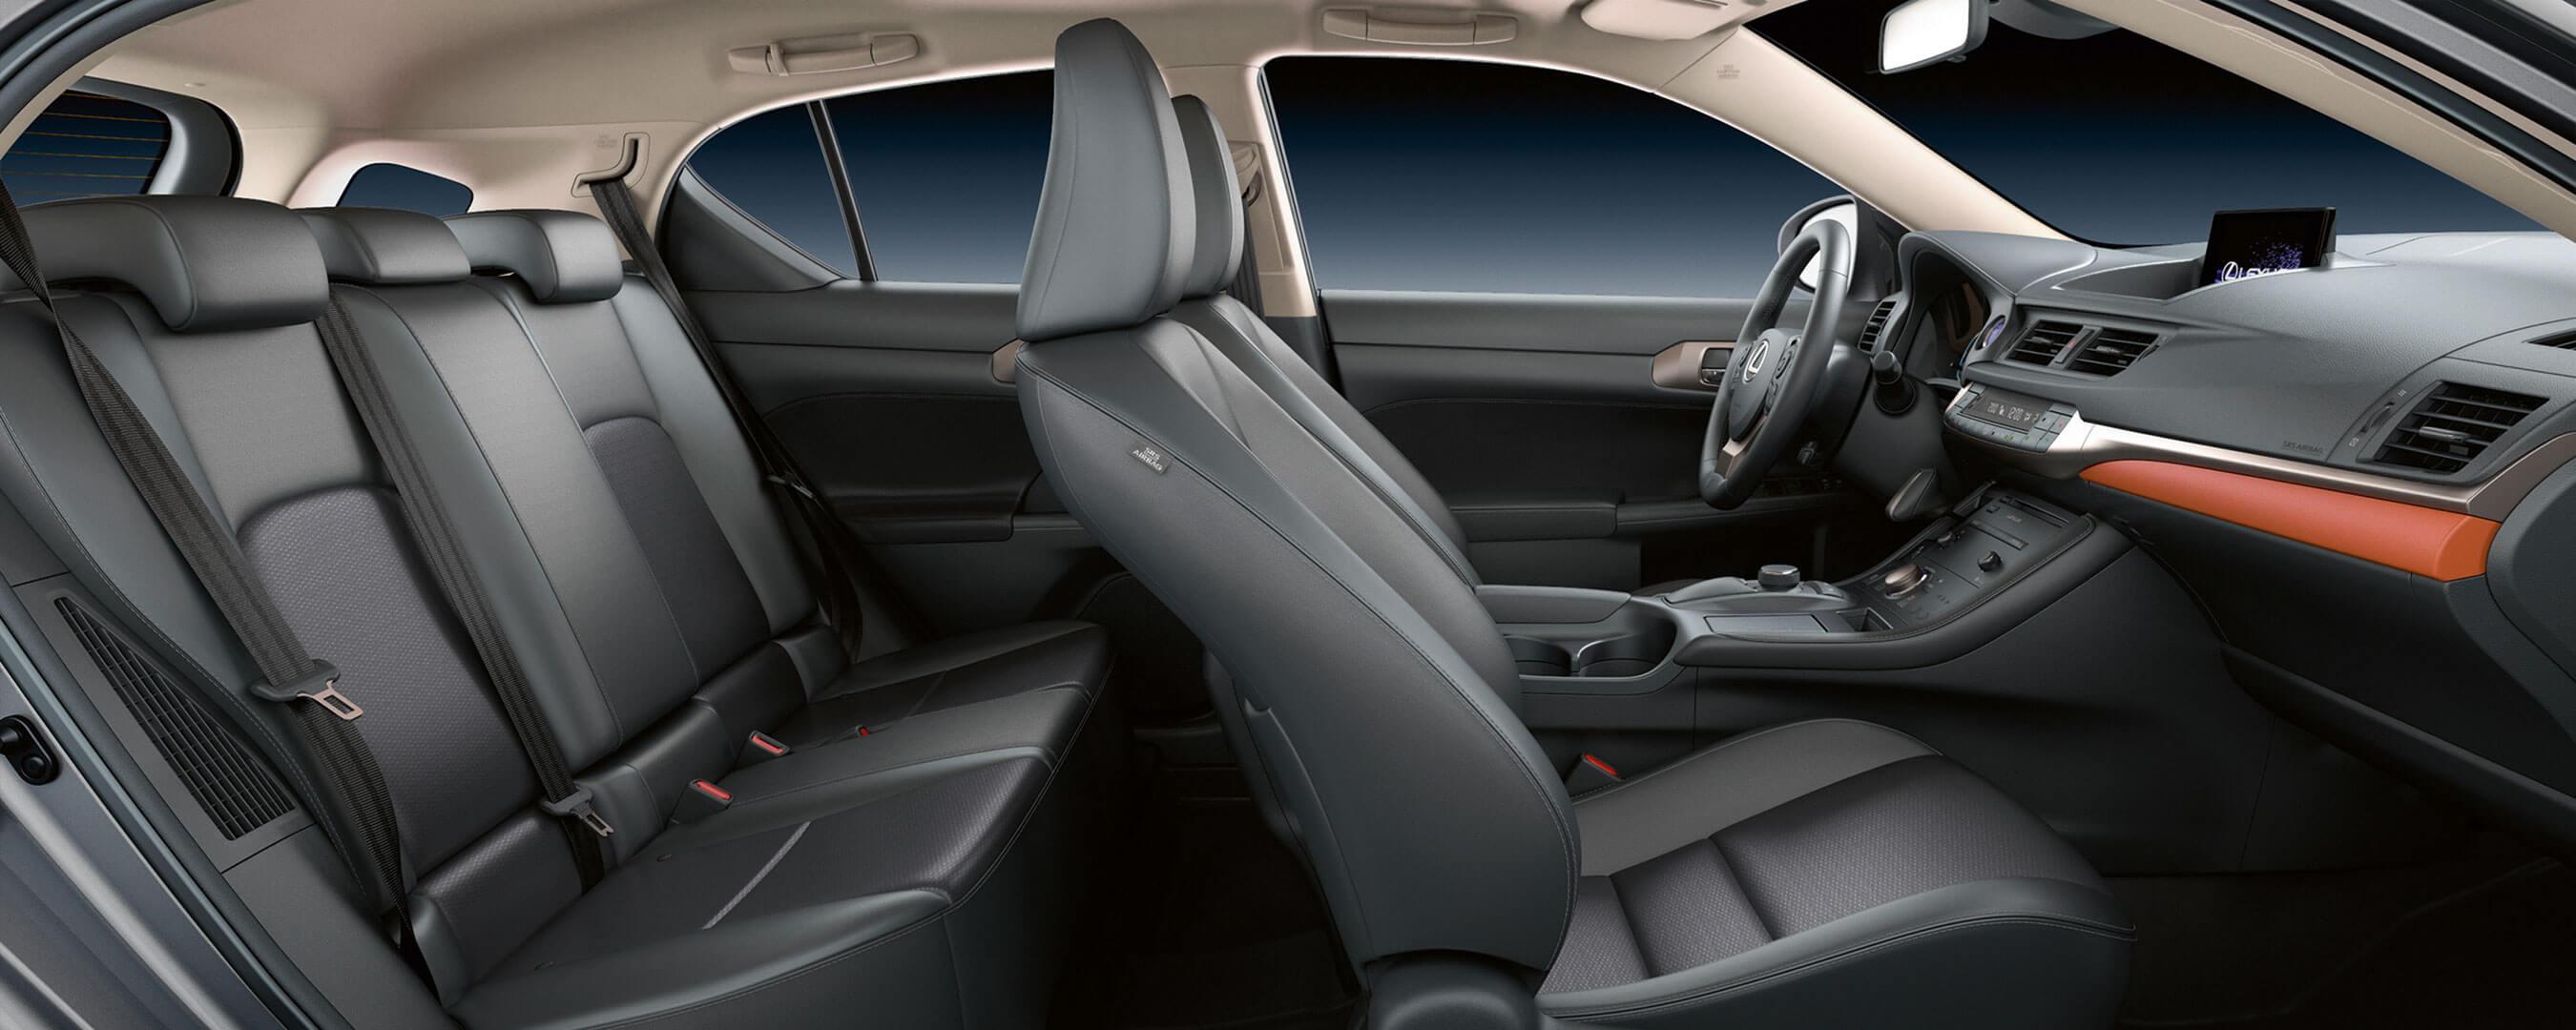 2018 lexus ct 200h my18 experience hero interior back